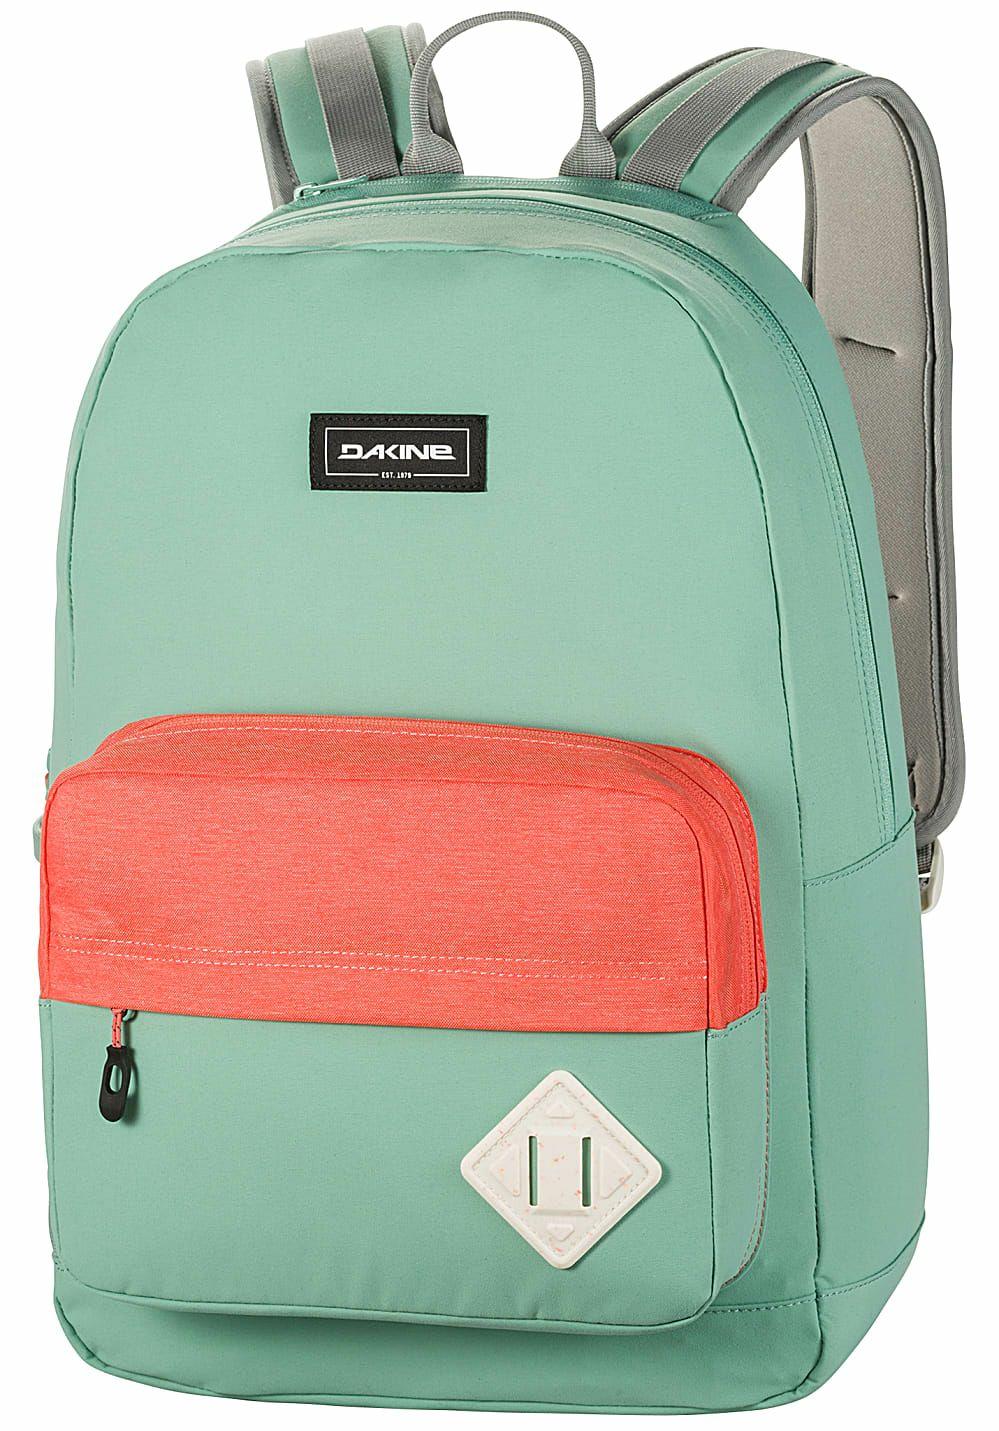 DAKINE 365 Pack 30L - Rucksack, 4 Farben, Maße: 30 x 46 x 21 cm